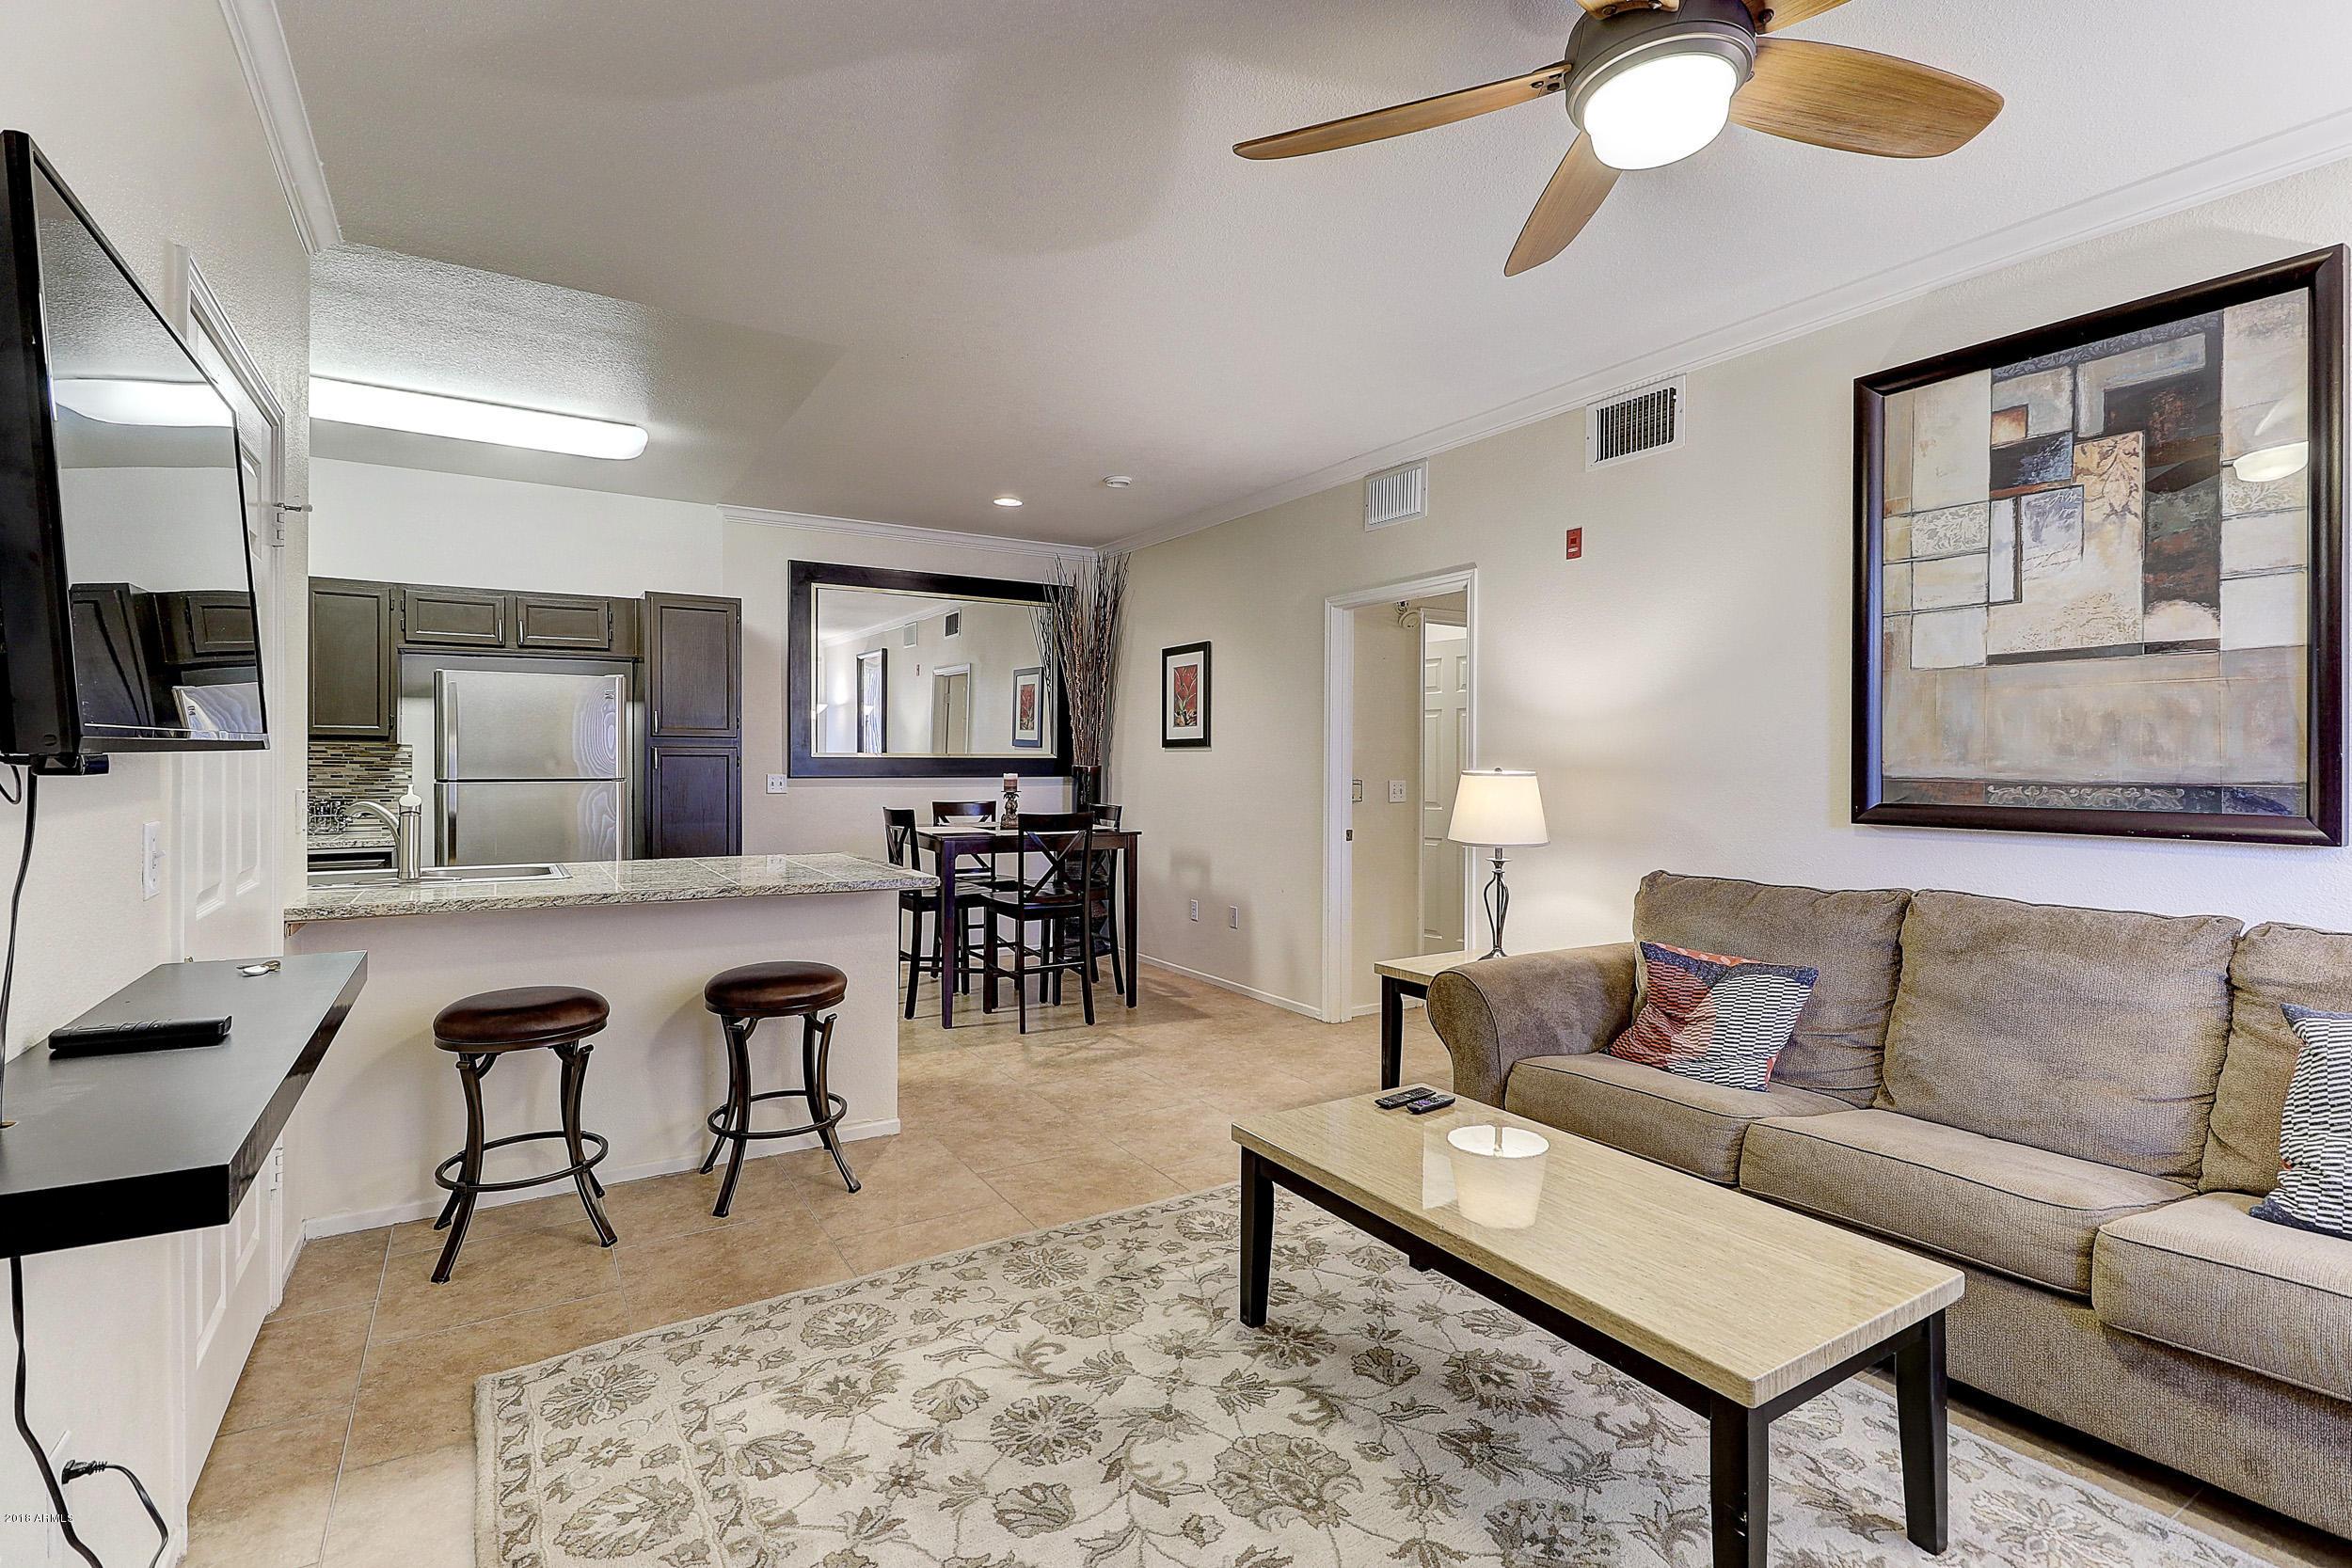 7009 E ACOMA Drive # 1011, Scottsdale, AZ 85254, 1 Bedroom Bedrooms, ,Residential Lease,For Rent,7009 E ACOMA Drive # 1011,6213477